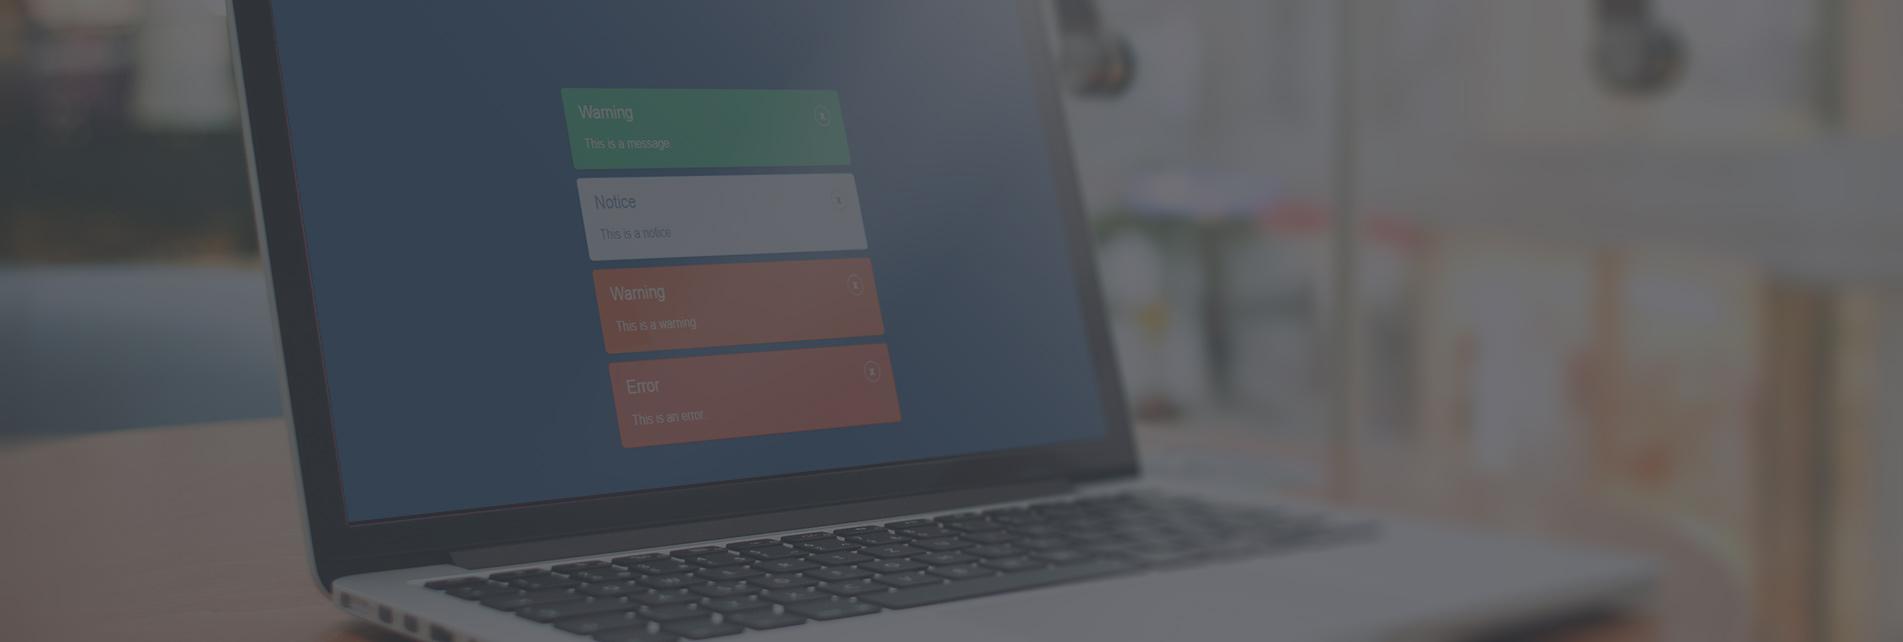 minitek-system-messages تغییر آیکون های مدیریت جوملا با QuickIcons  - گلچین آنلاین